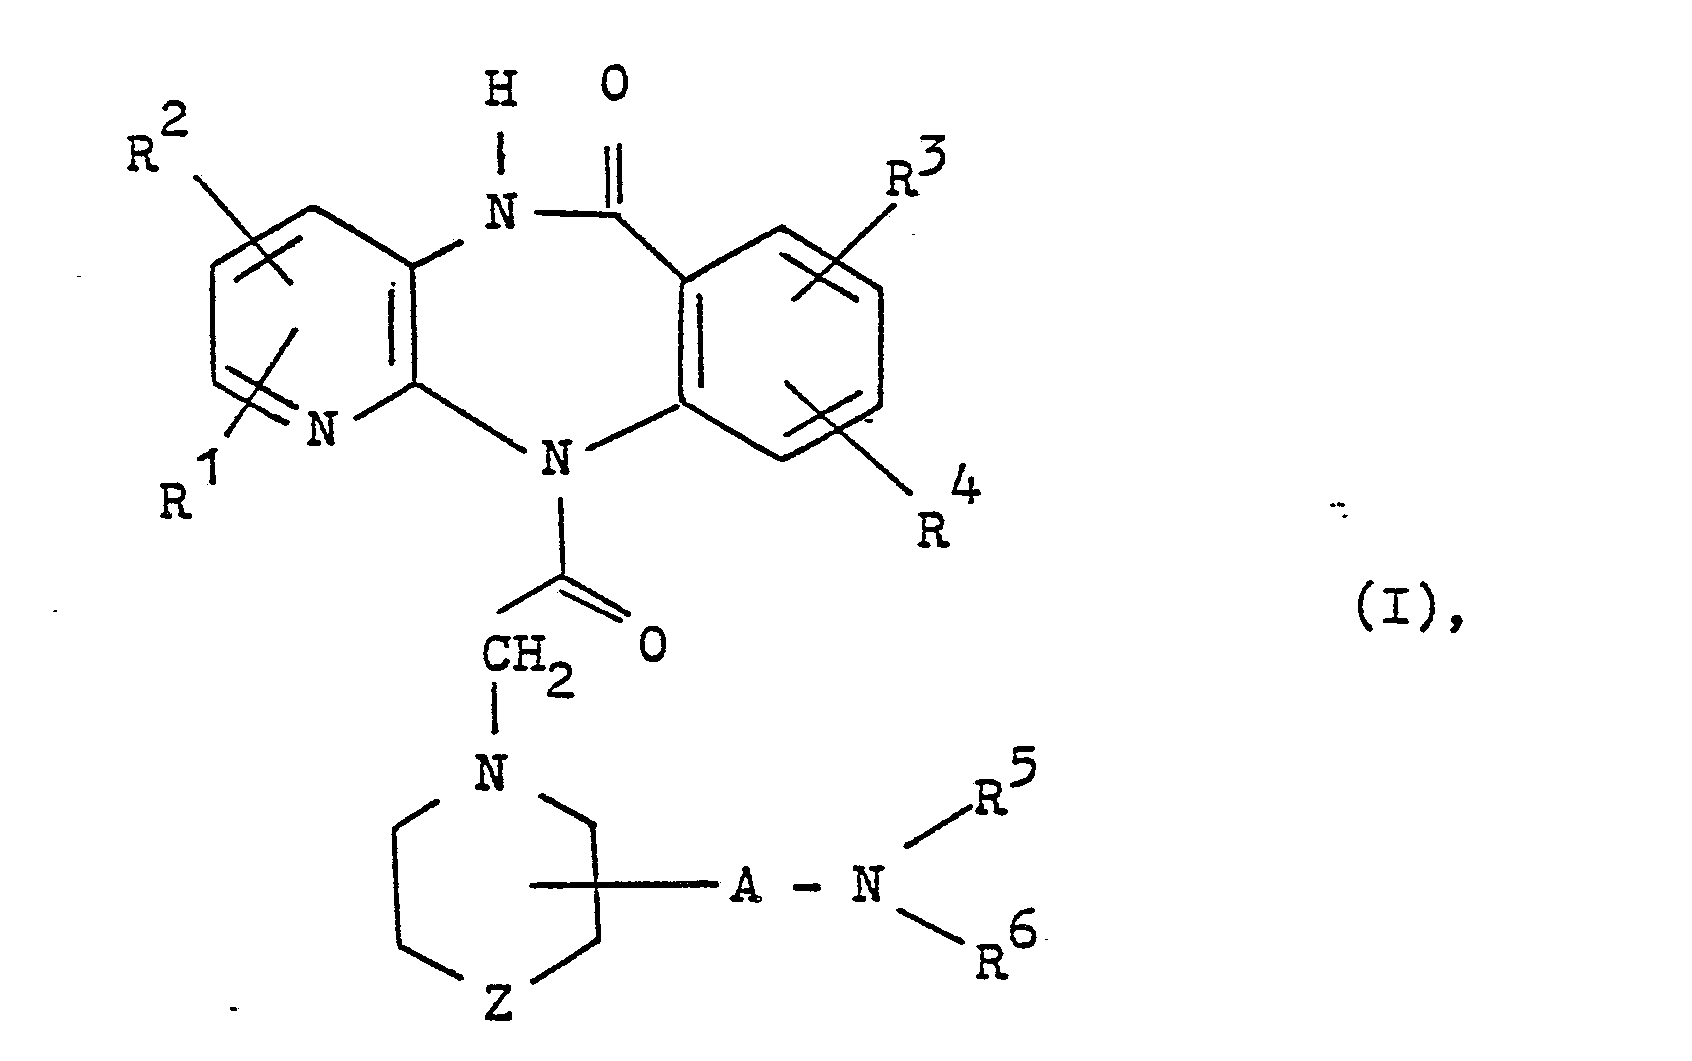 Ep0254955a2 Substituierte Pyrido 23 B14benzodiazepin